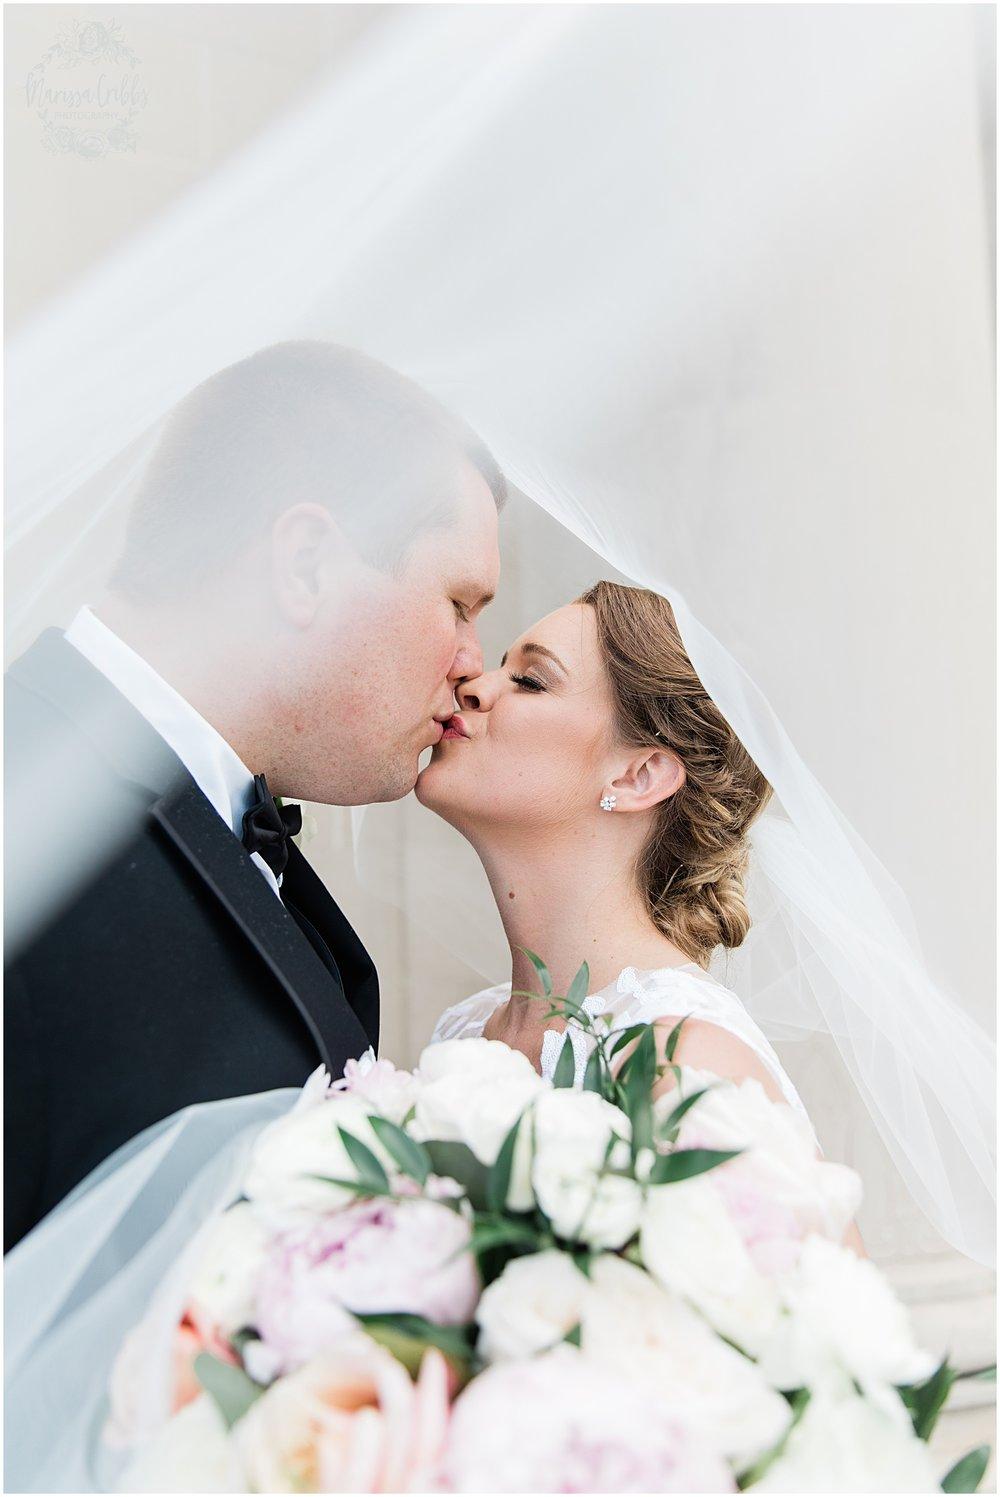 LAKE QUIVIRA COUNTRY CLUB WEDDING | MORGAN & RYAN | MARISSA CRIBBS PHOTOGRAPHY_5470.jpg